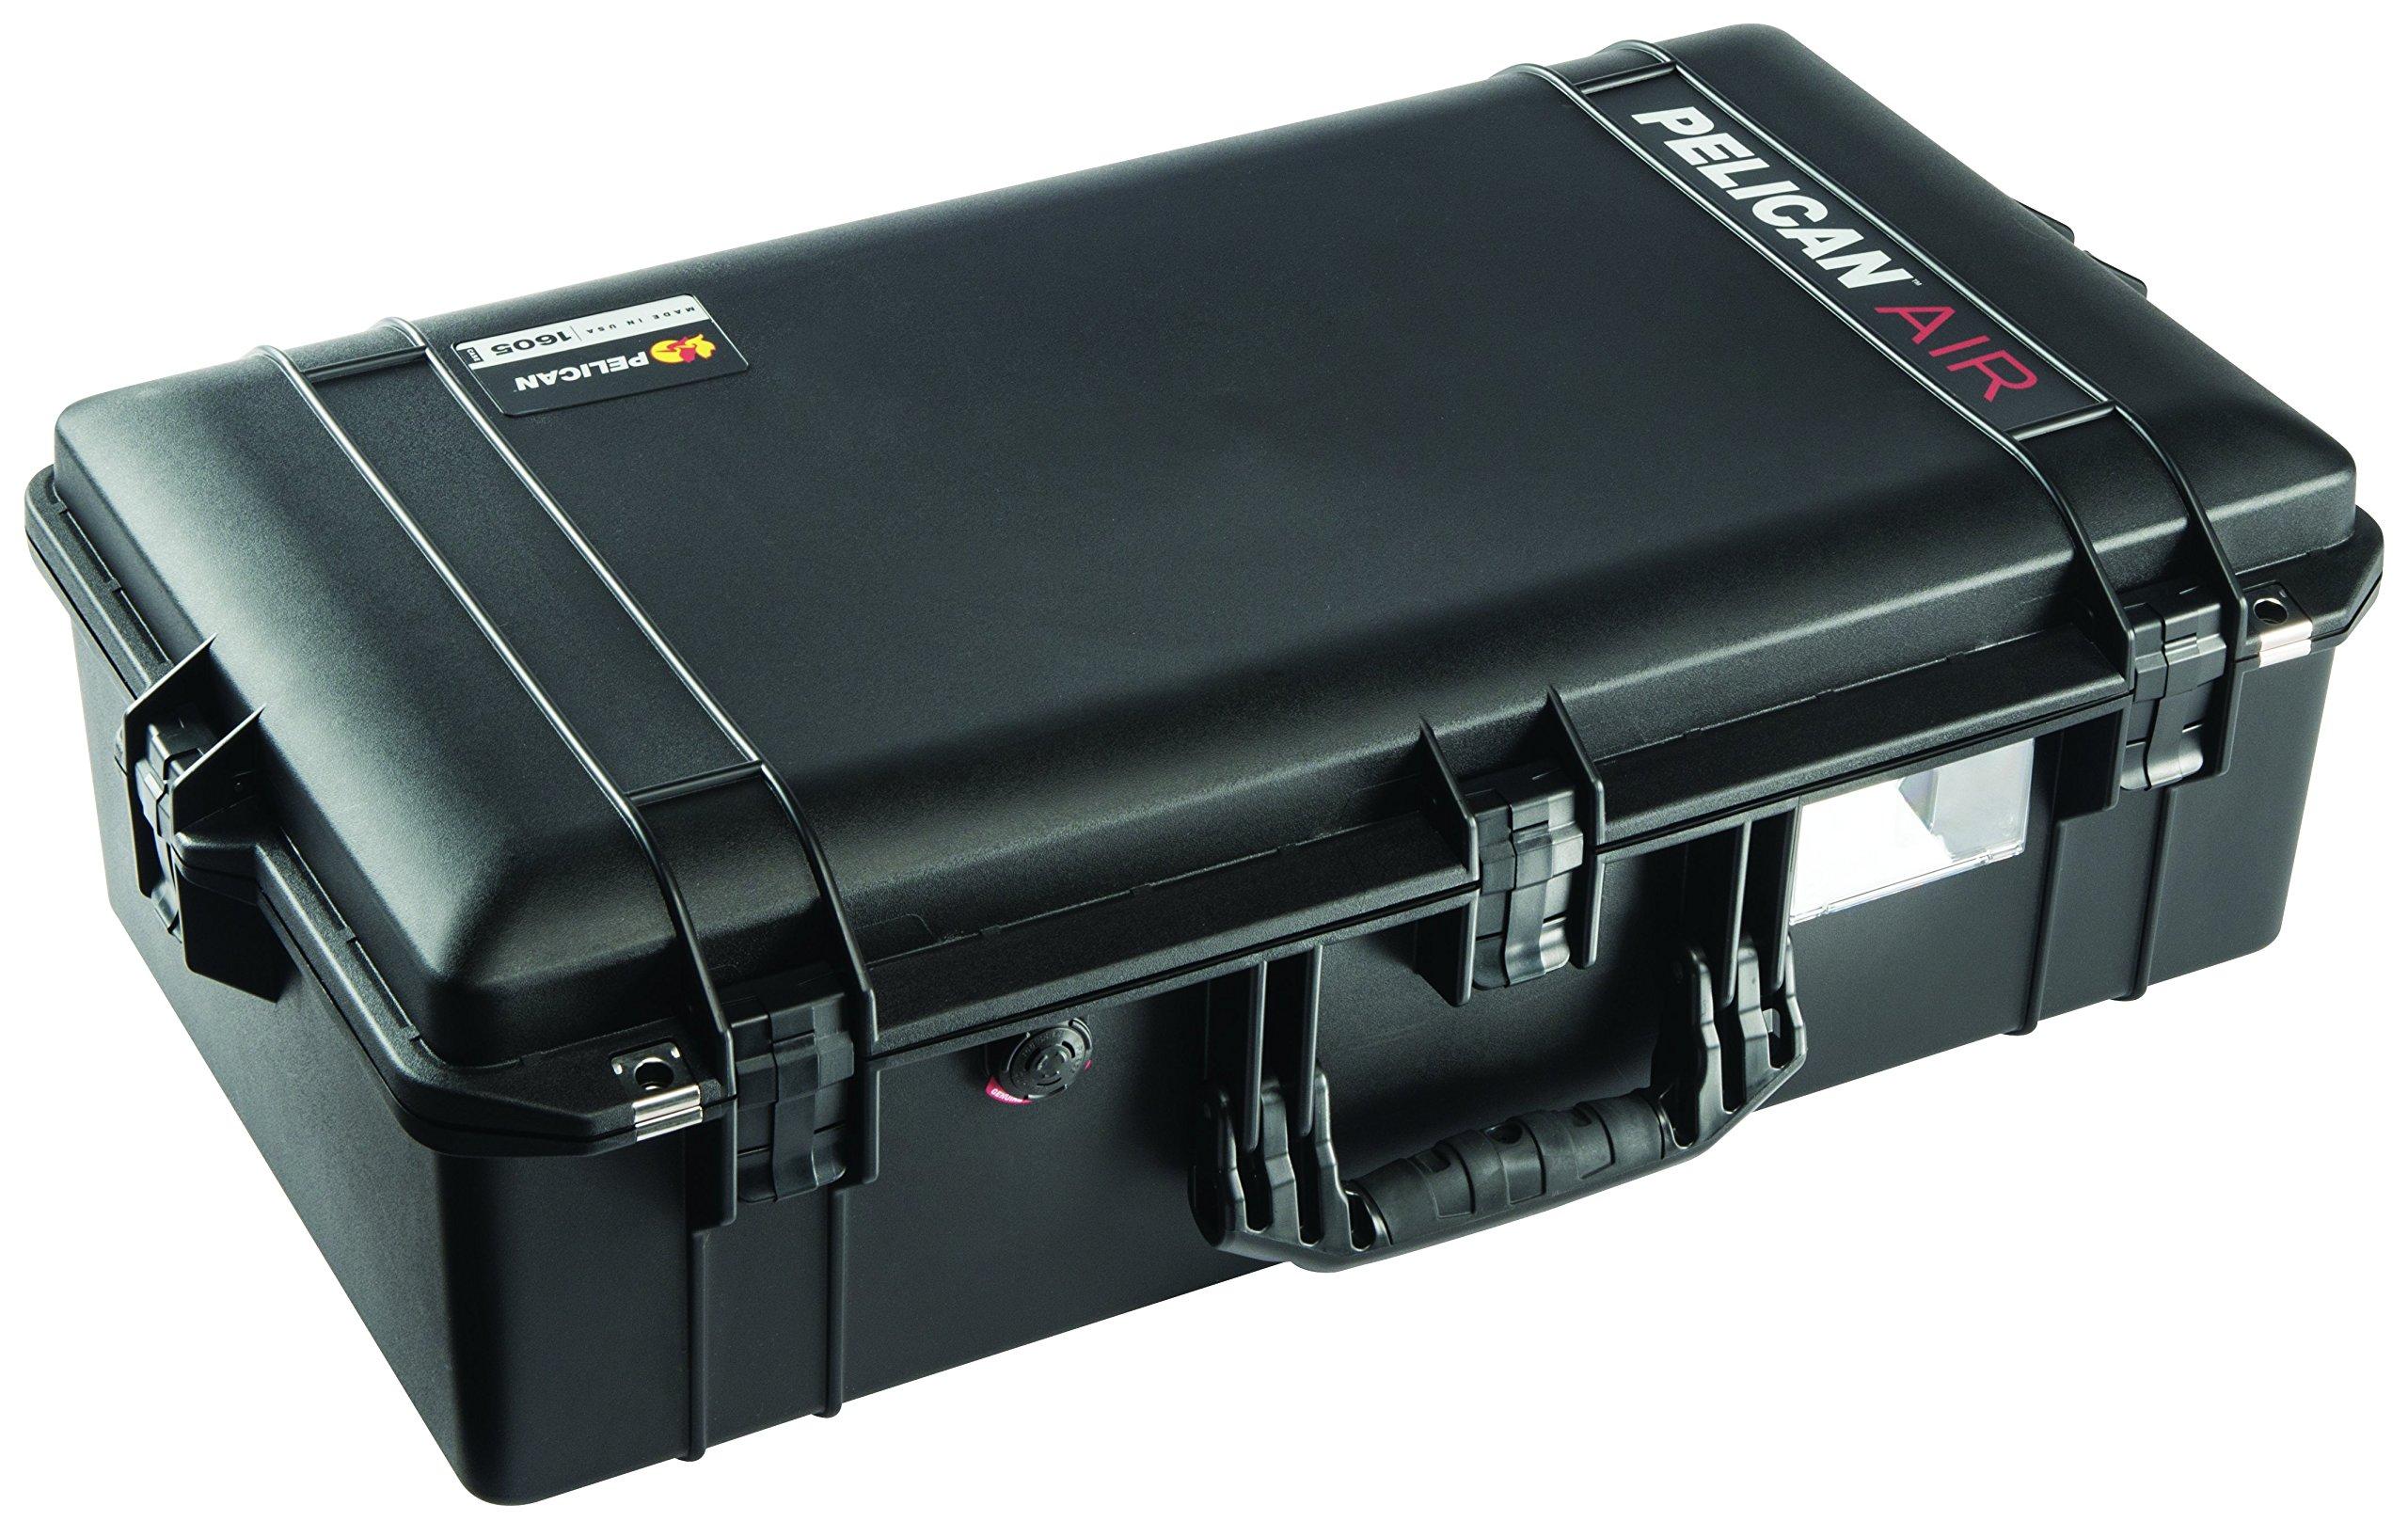 Pelican Air 1605 Case With Foam (Black)